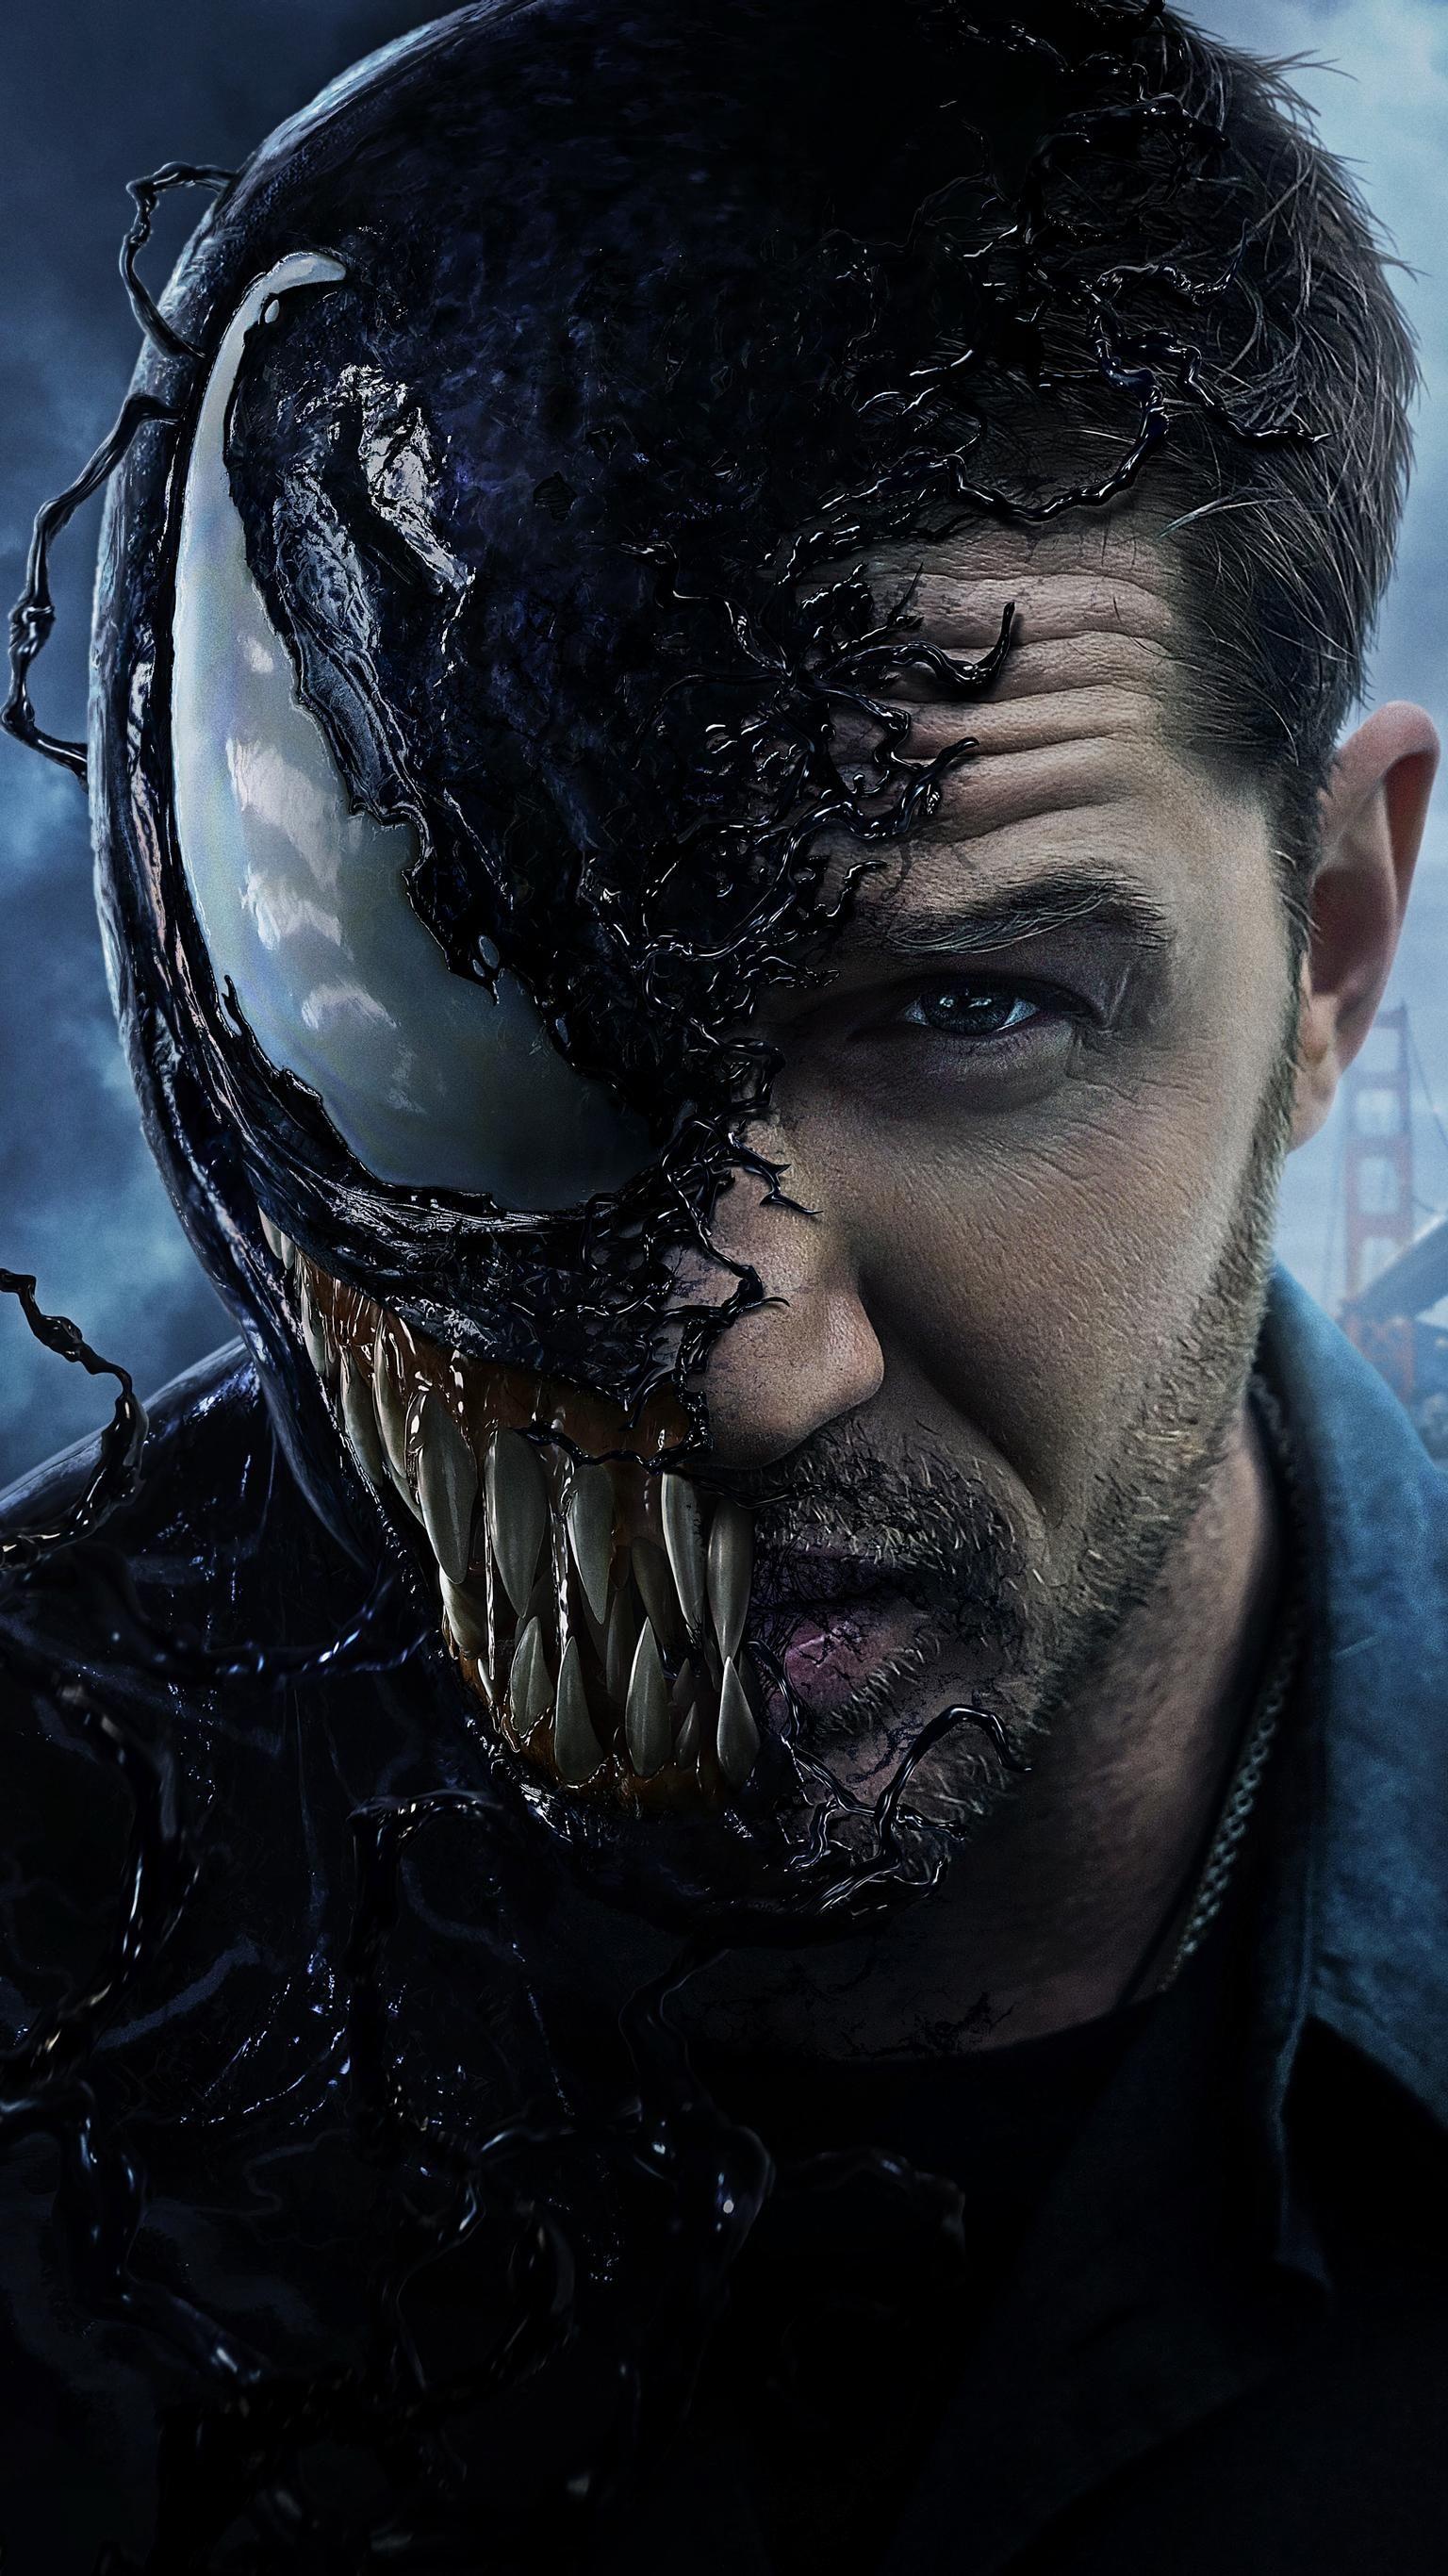 Venom 2018 Phone Wallpaper Moviemania In 2021 Venom Movie Venom Pictures Venom Comics